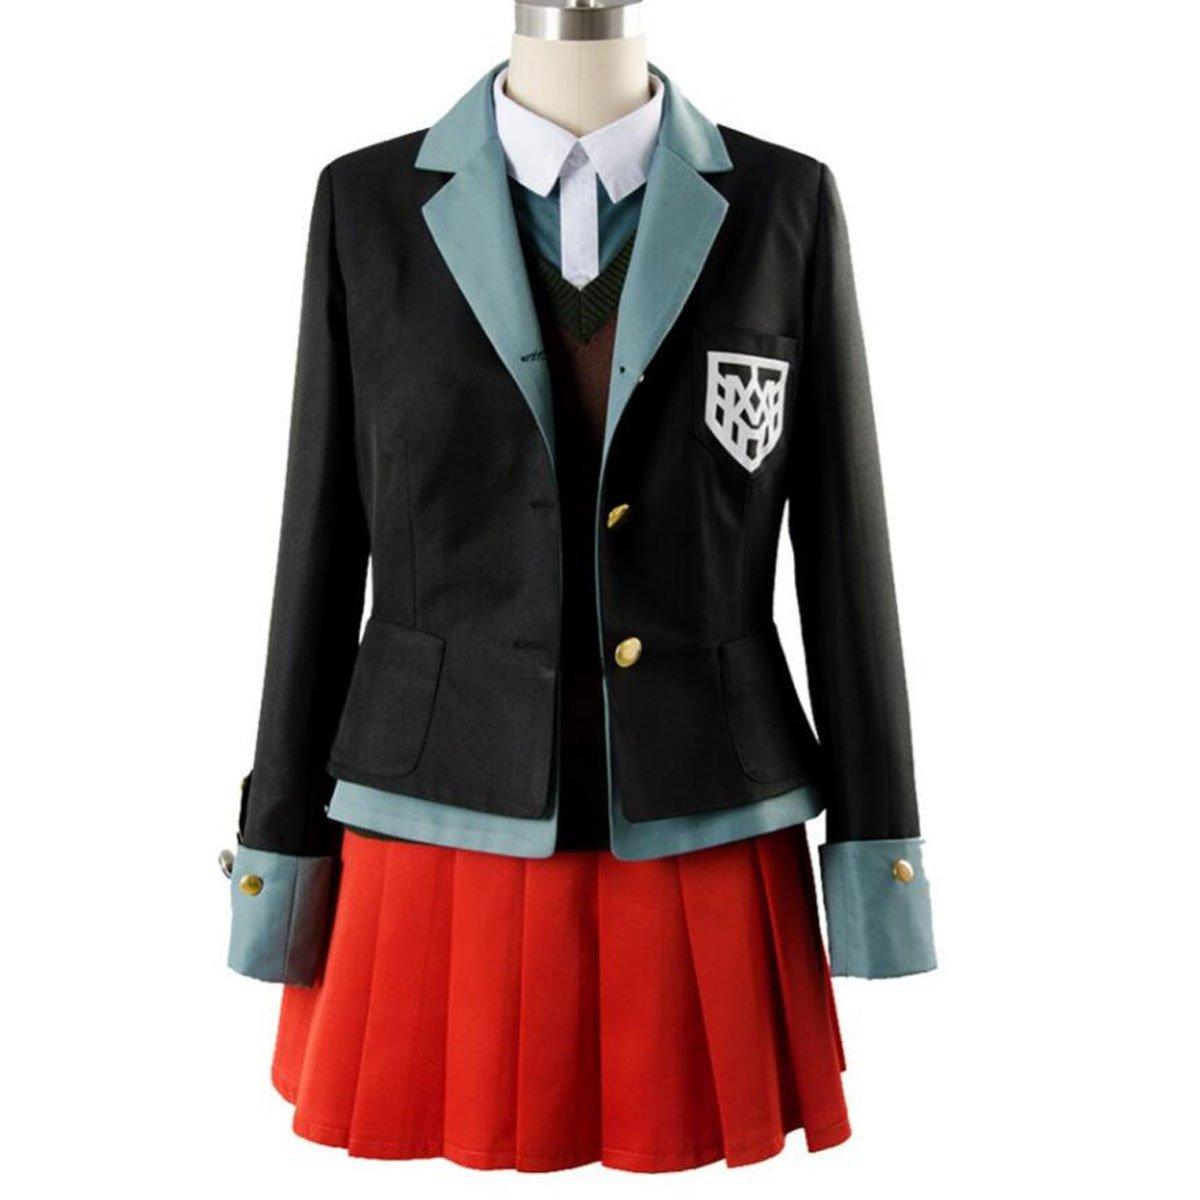 NSOKing Danganronpa V3 Yumeno Himiko The New Bullet Rreaks Costume Outfit (Medium, Black)